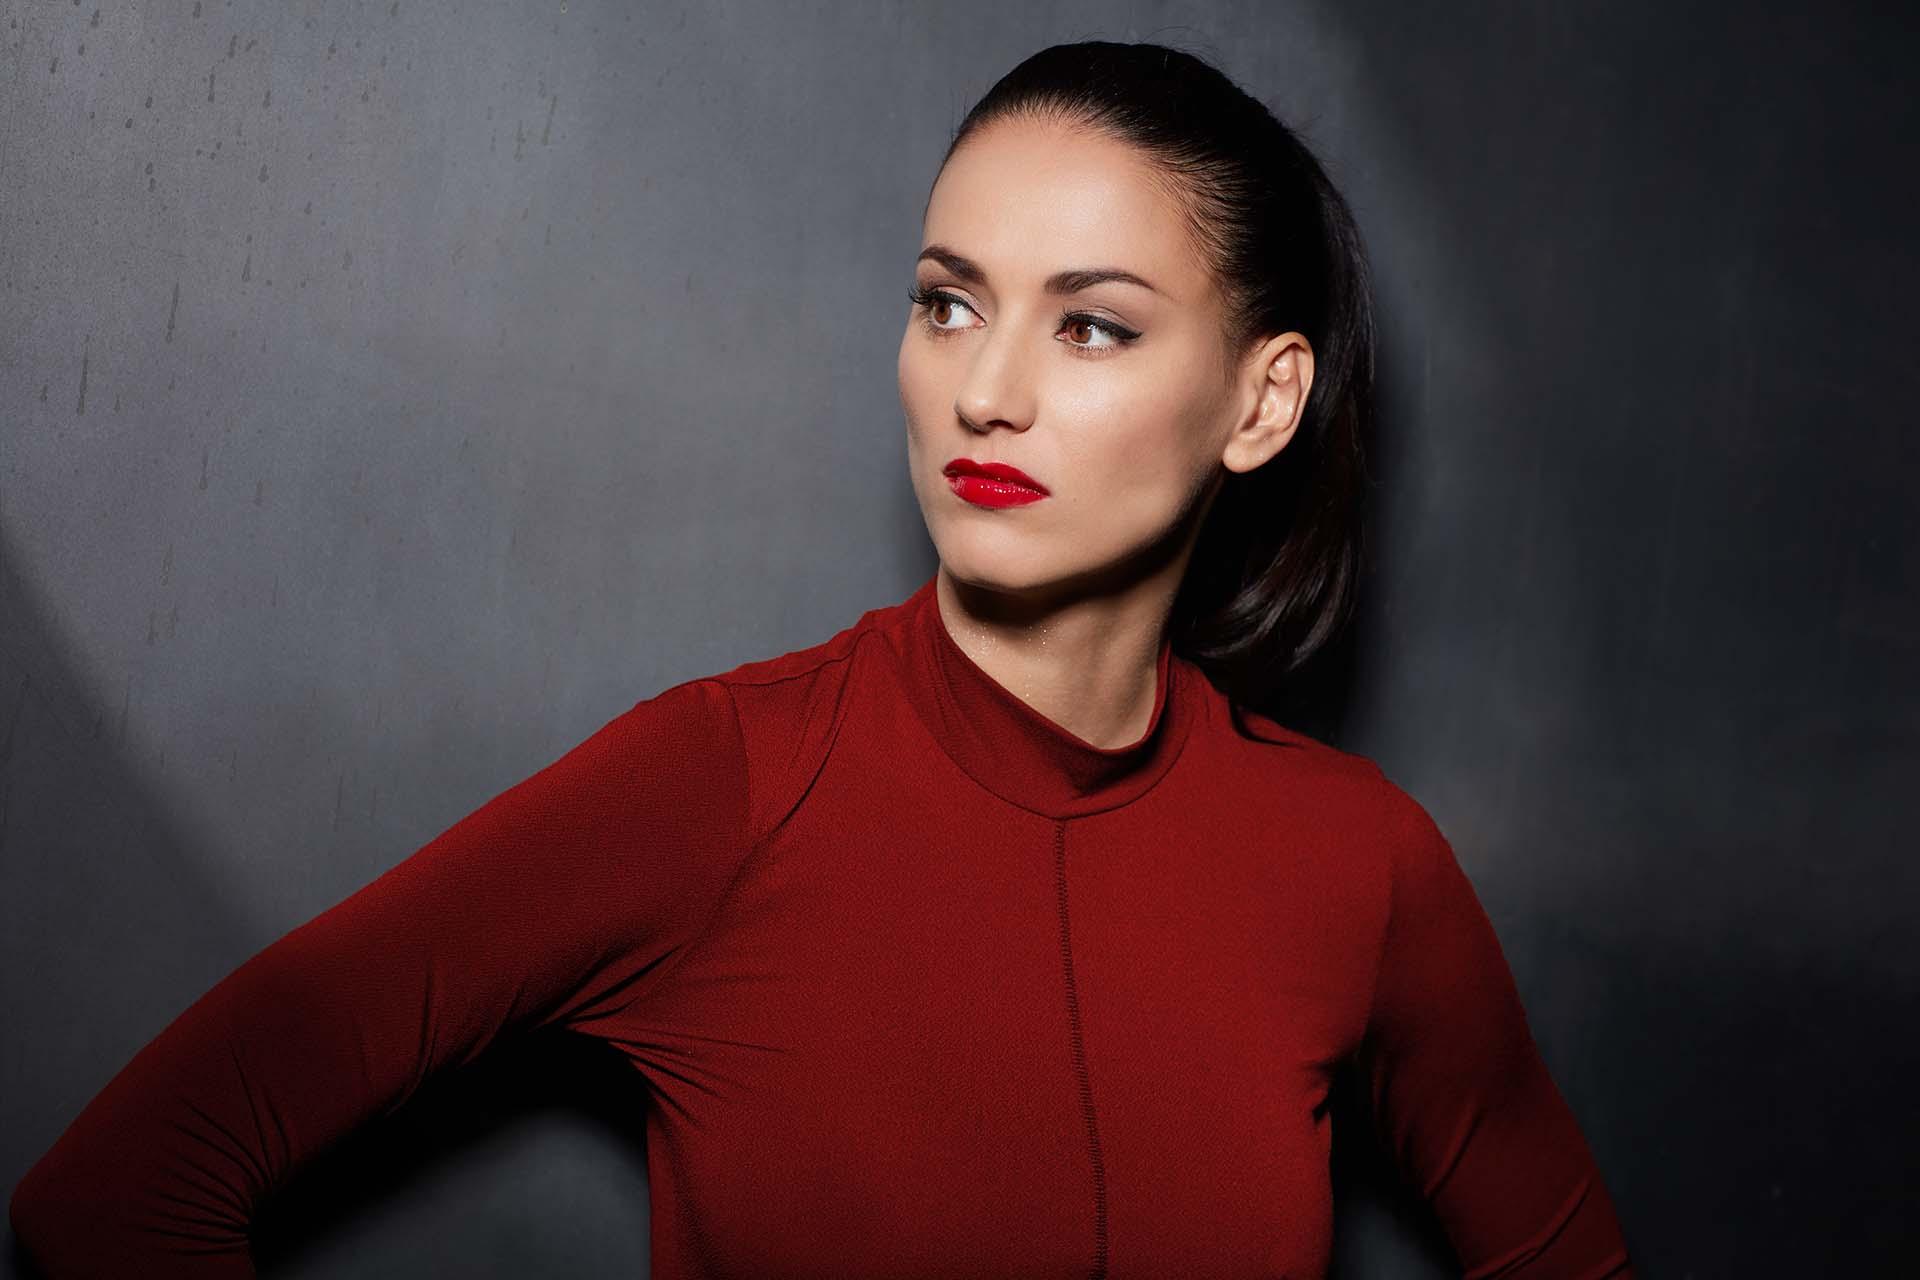 Zsuzsanna Ripli :: Portrait shooting, H20 LifeStyle Studio